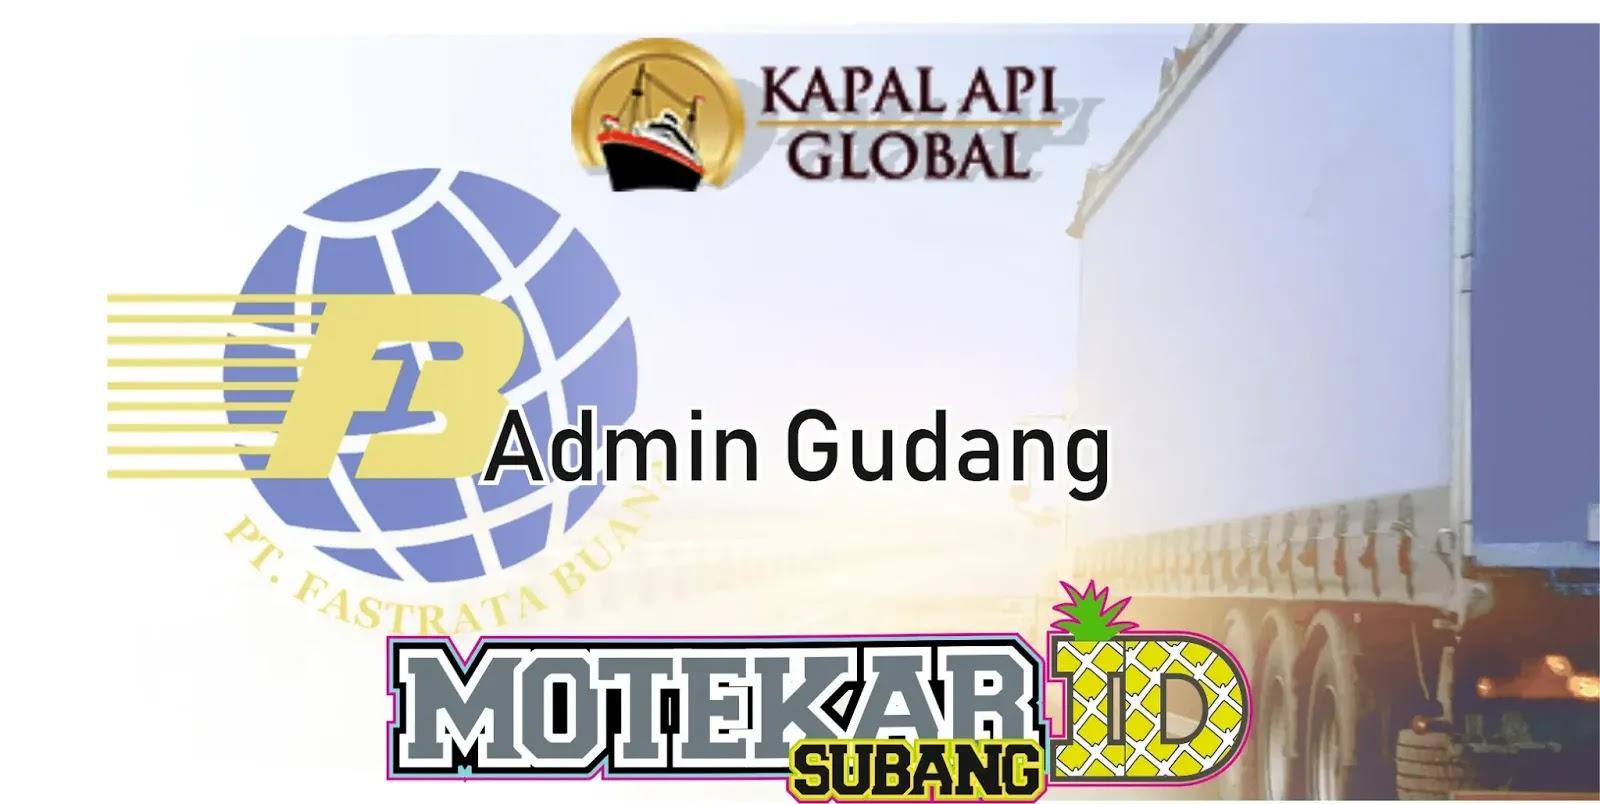 Info Loker Admin Gudang Distributor Kapal Api Fastrata Buana Subang 2019 Motekar Subang